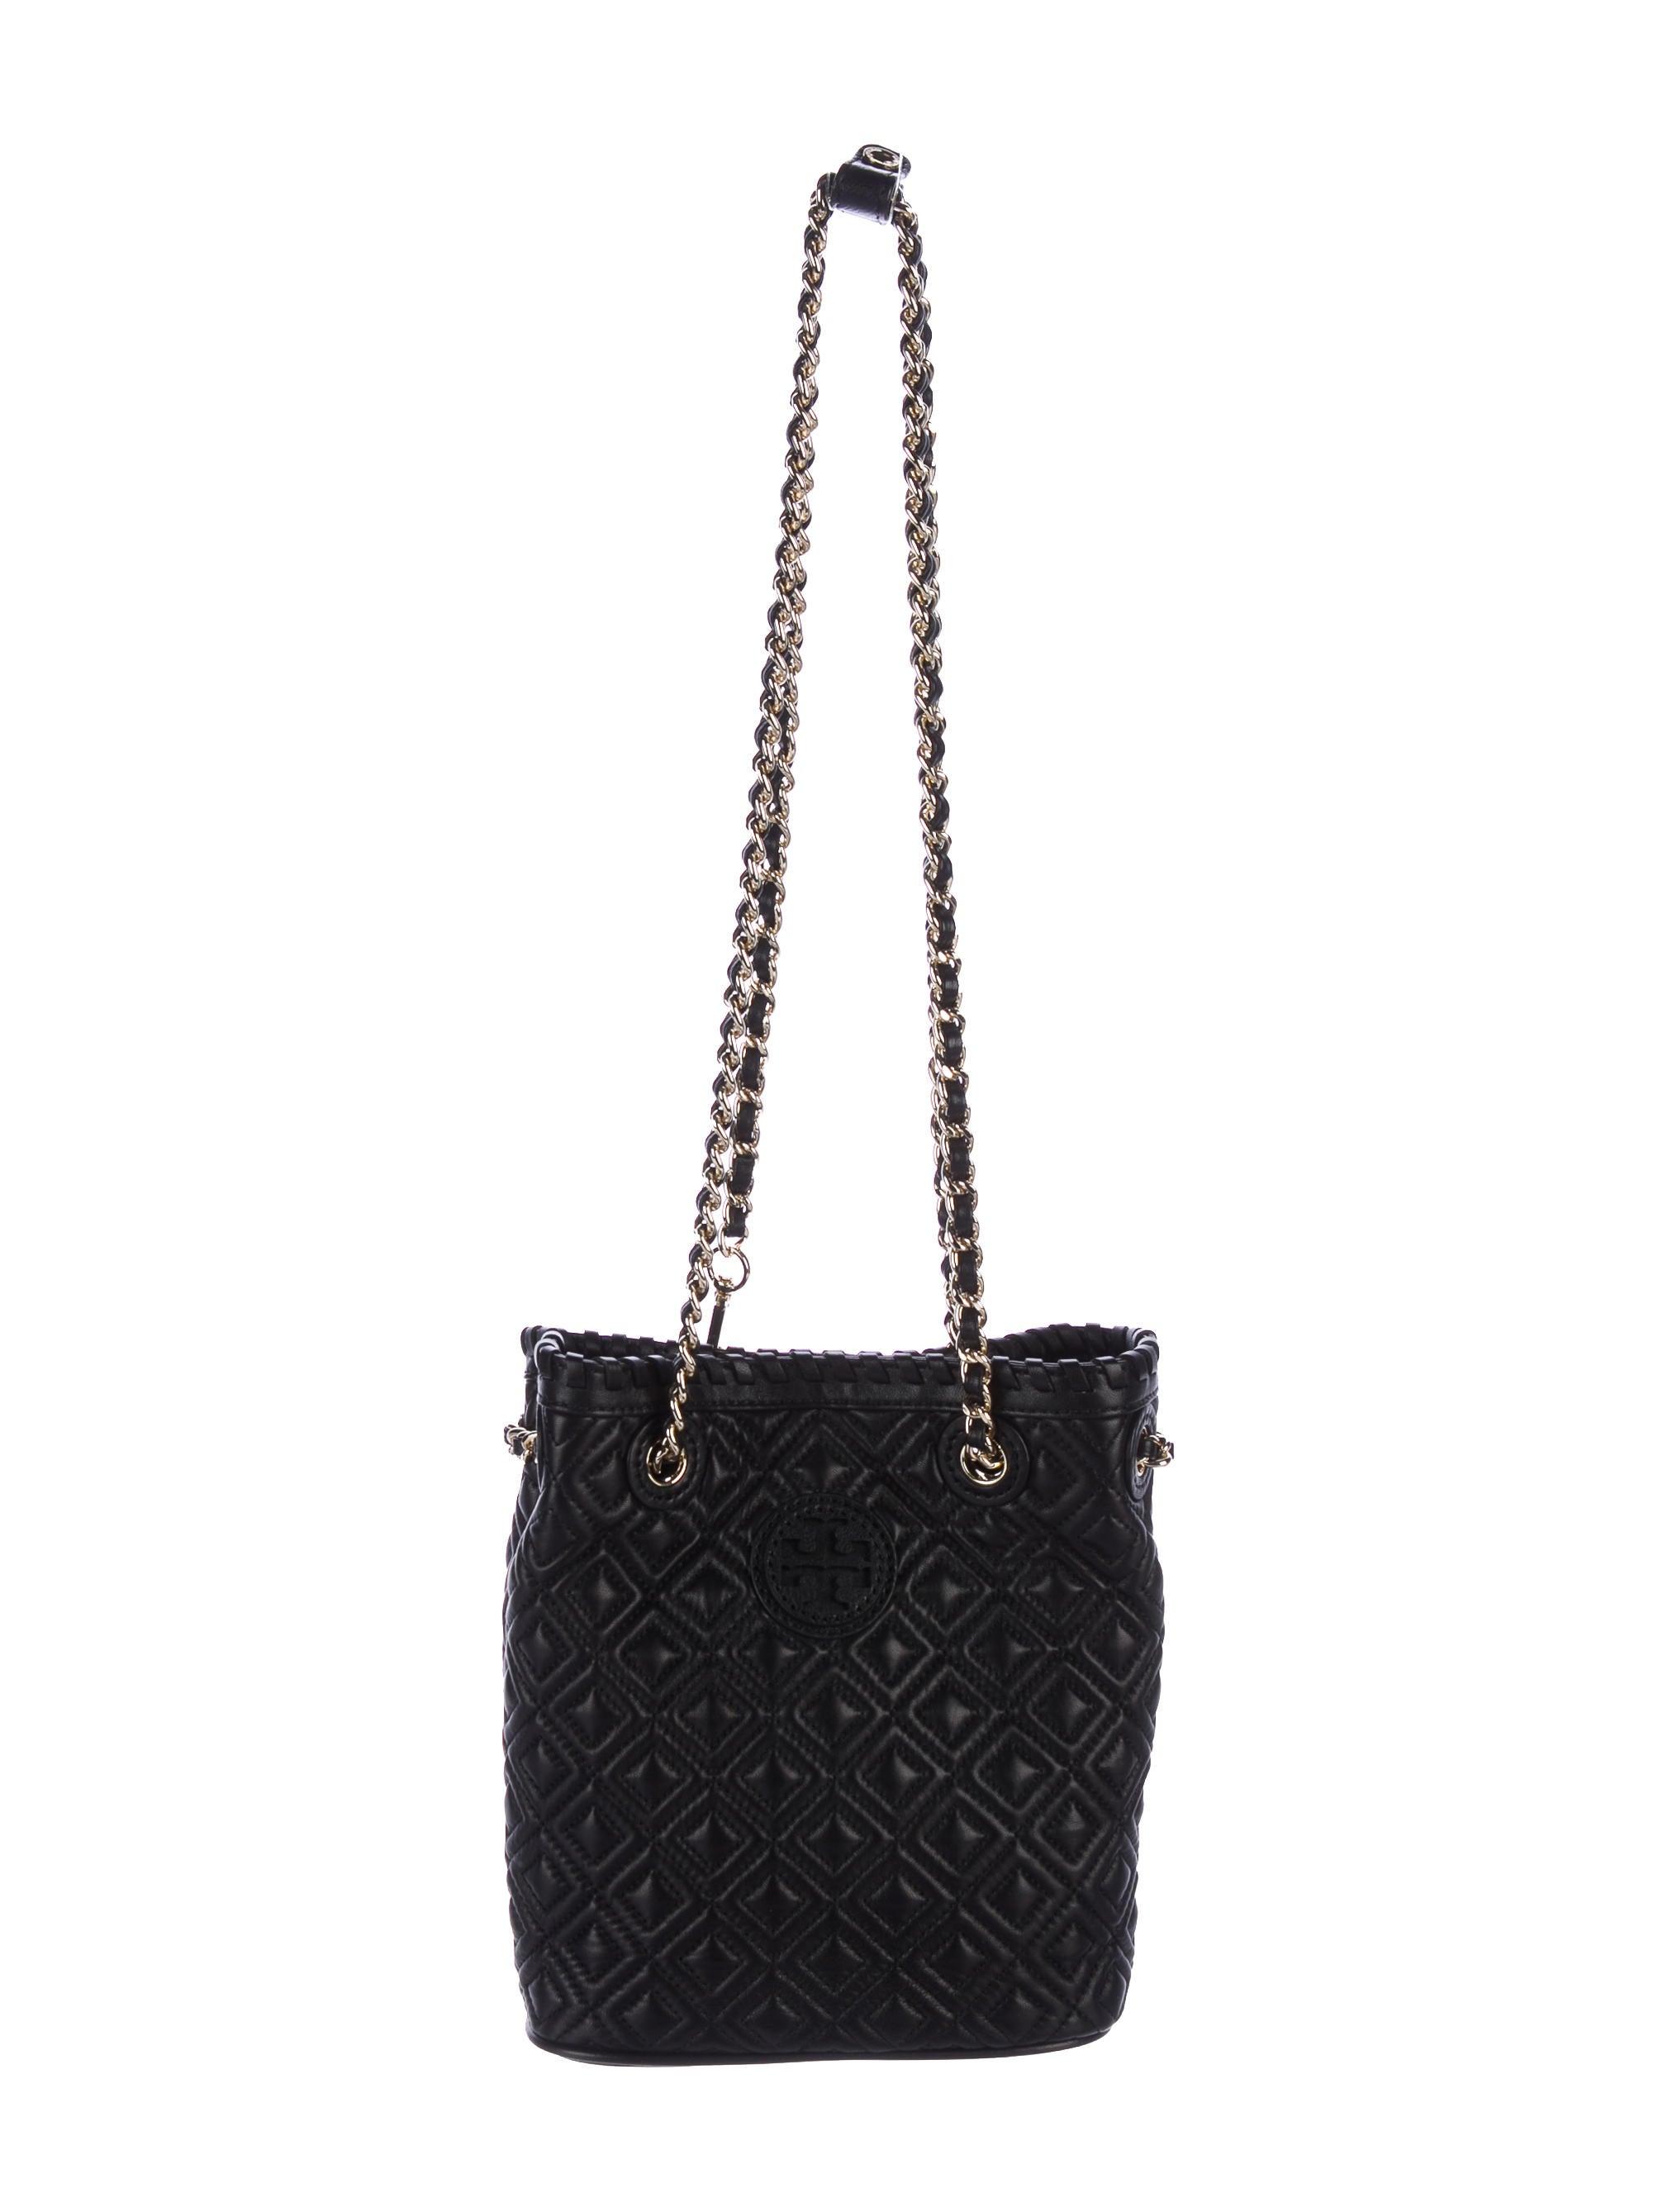 bryant handbags burch leather marion bag quilted black com tory amazon dp quilt shoulder